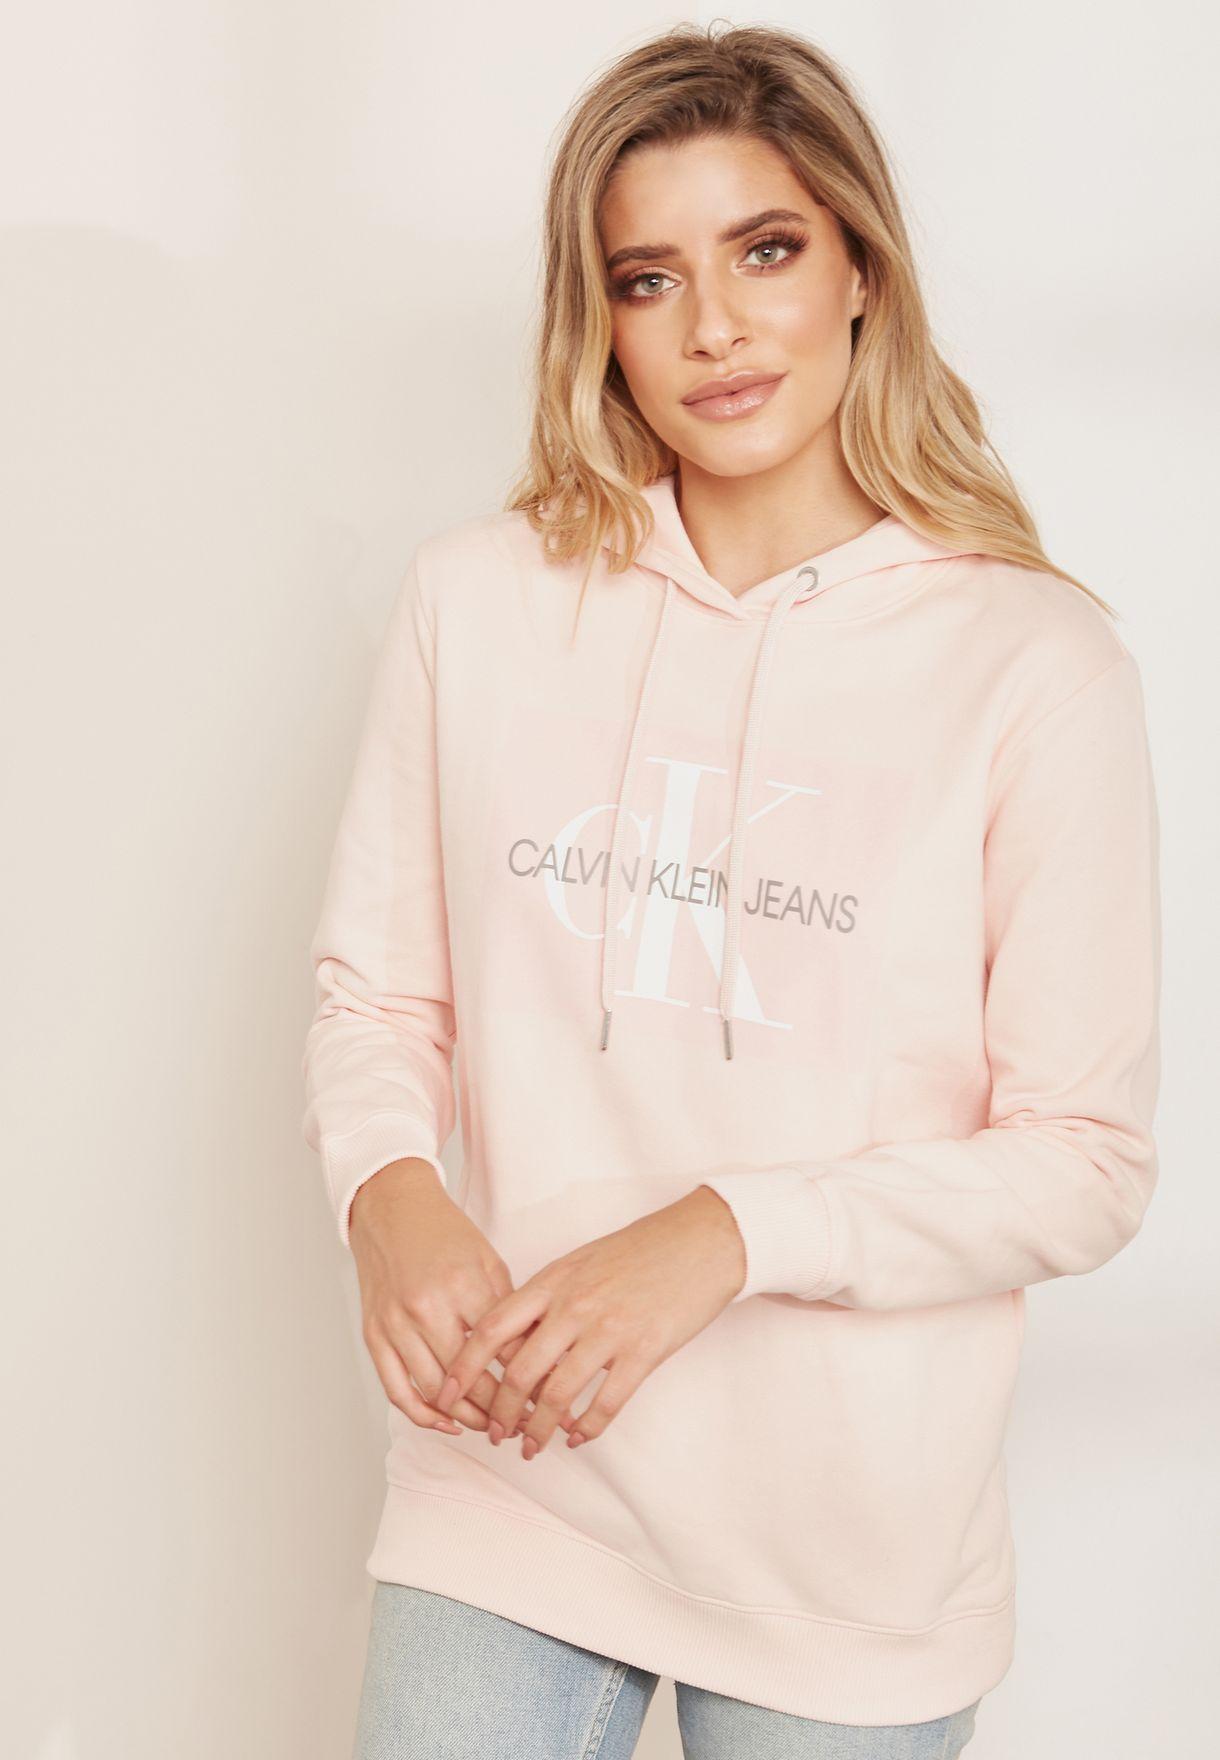 b390f1451b9 Shop Calvin Klein Jeans pink Oversized Logo Hoodie J20J208559 for ...